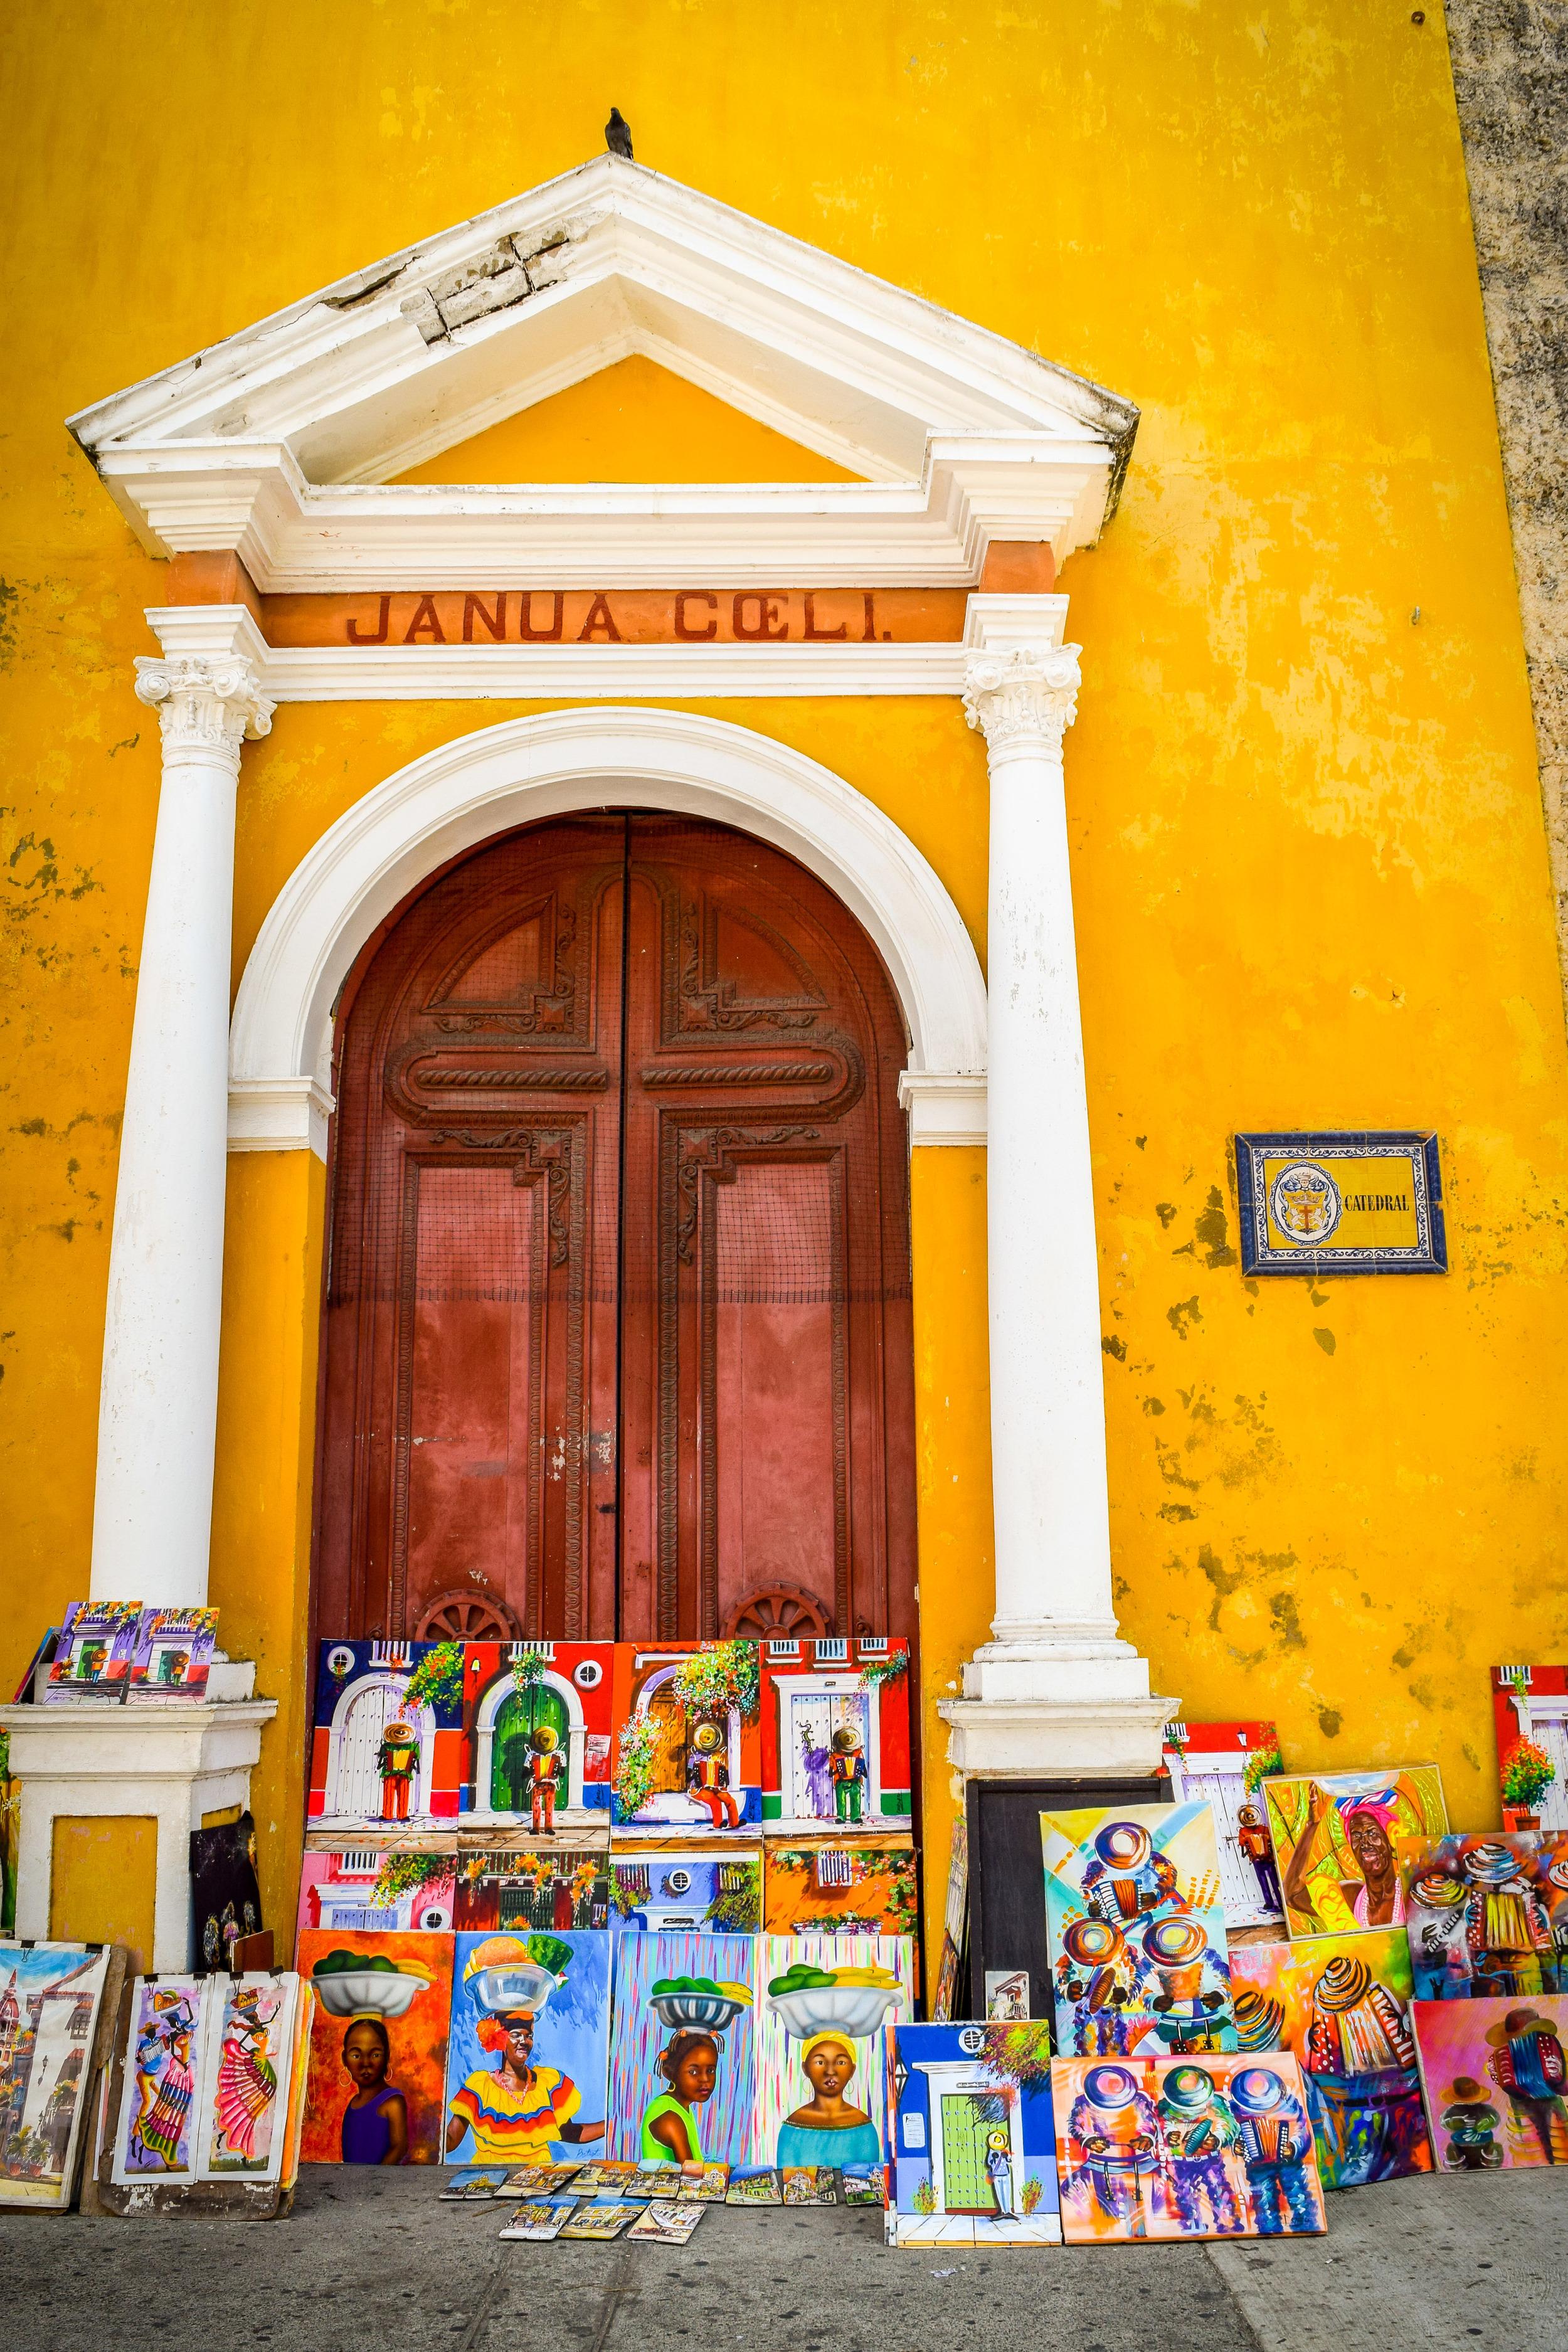 Artwork for sale in Cartagena